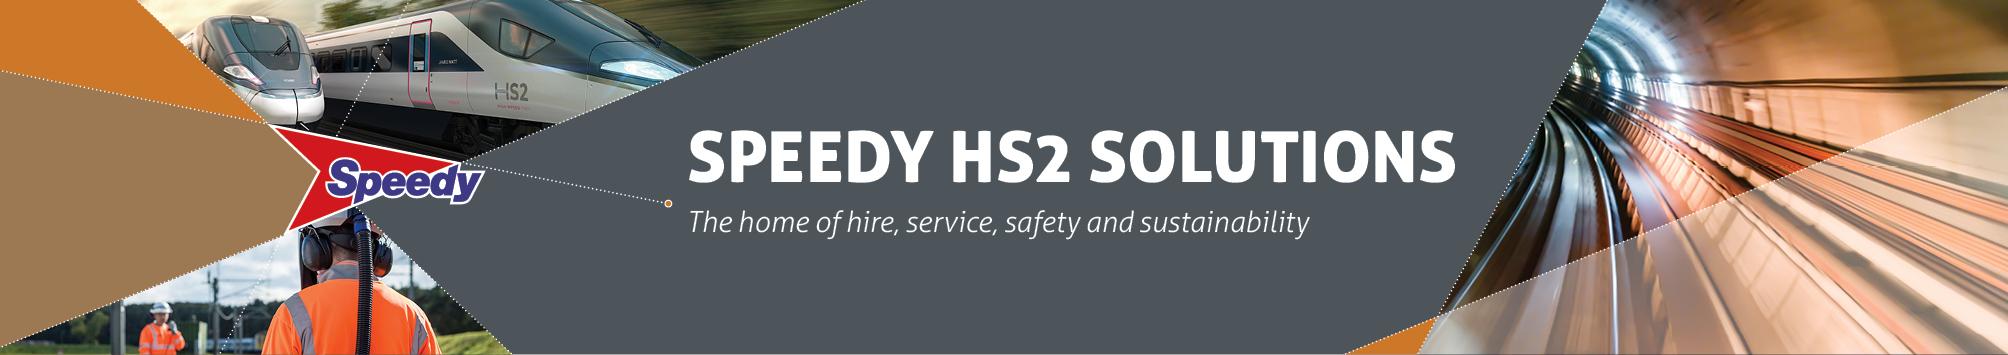 HS2 Landing Page Header.jpg